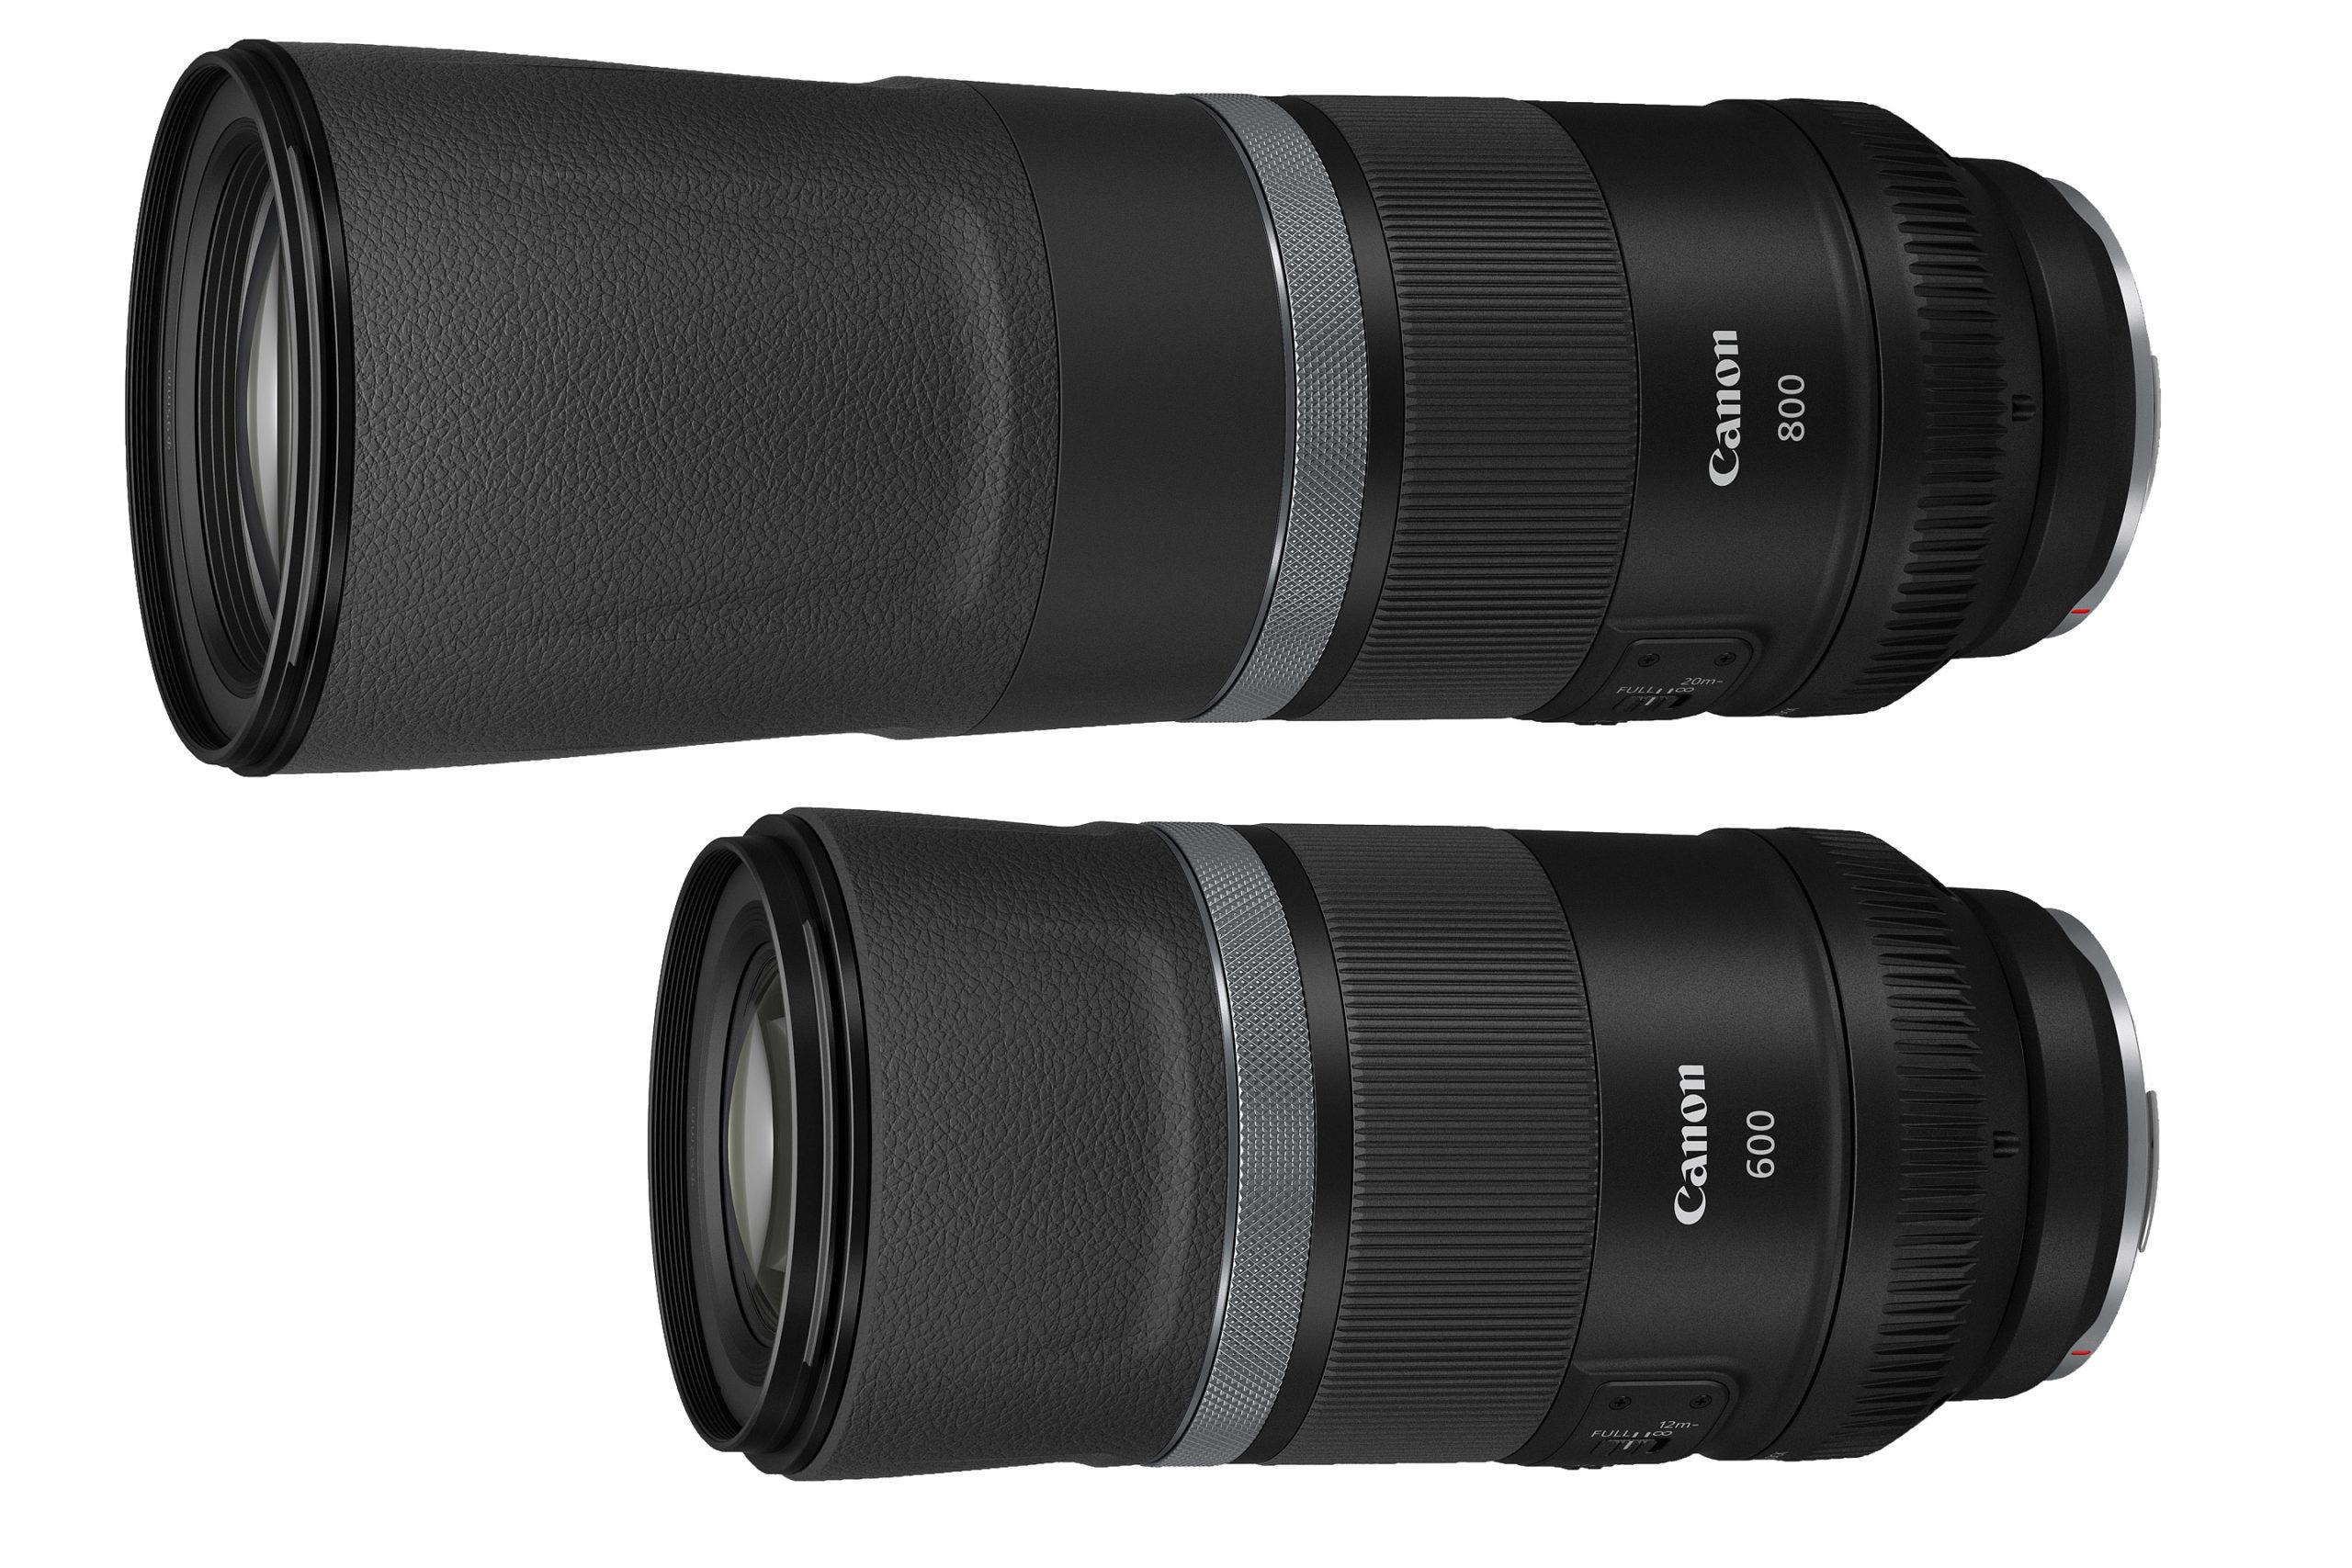 Srovnání Canon RF 800/11 IS STM a RF 600/11 IS STM